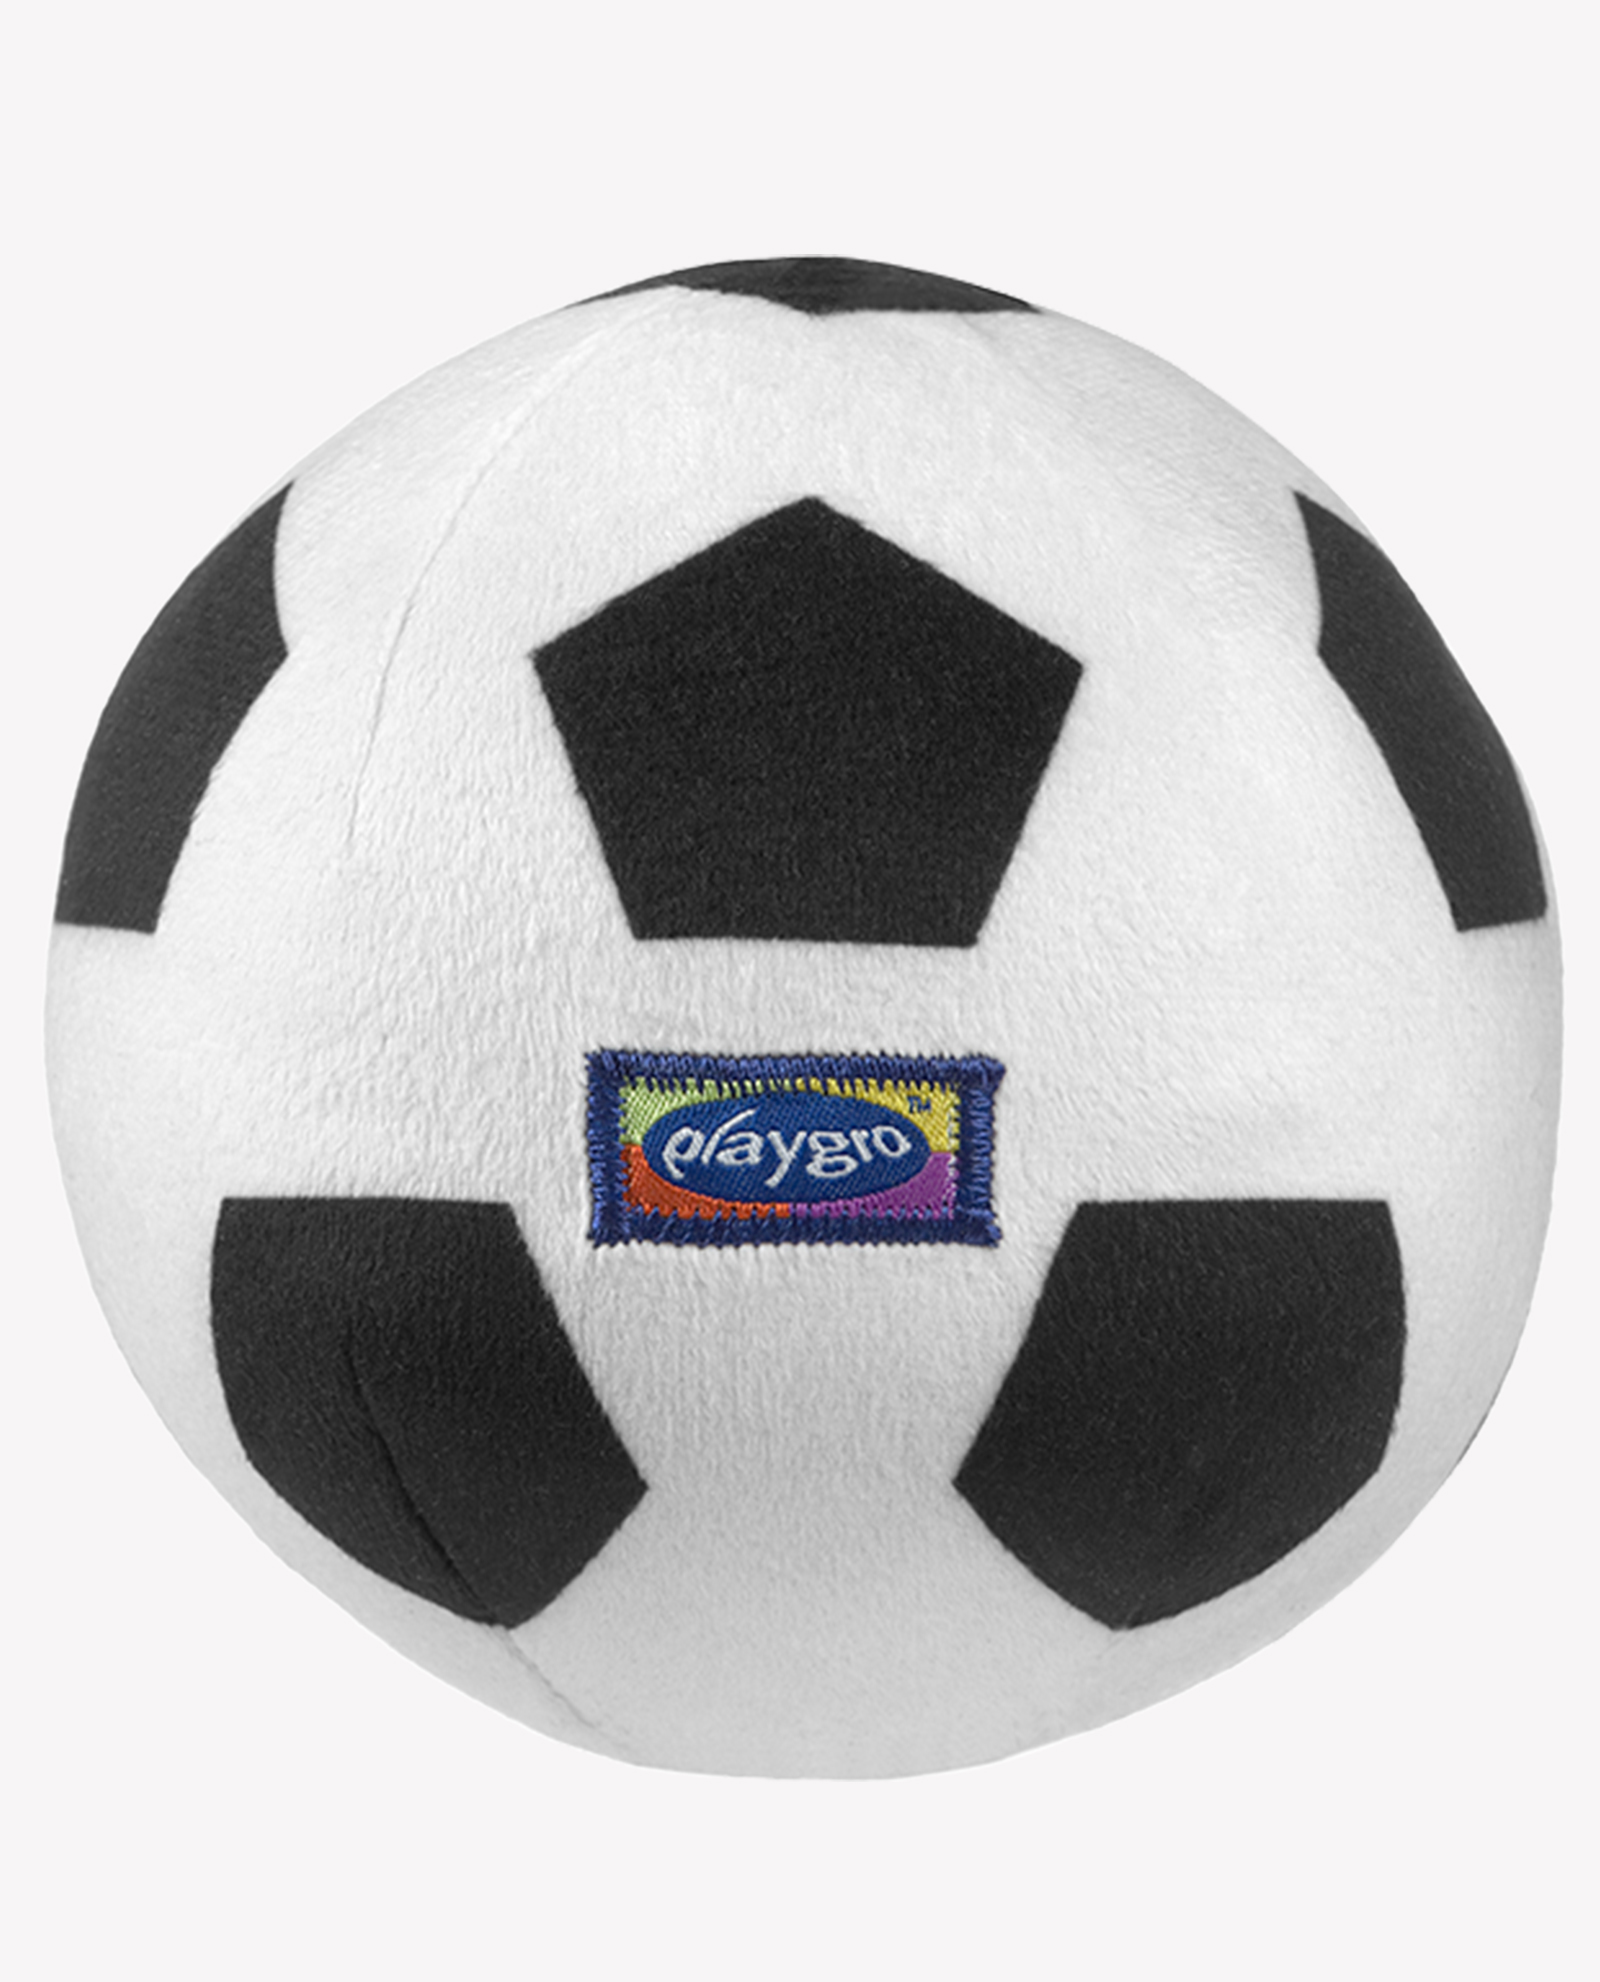 My First Soccer Ball (Black & White)